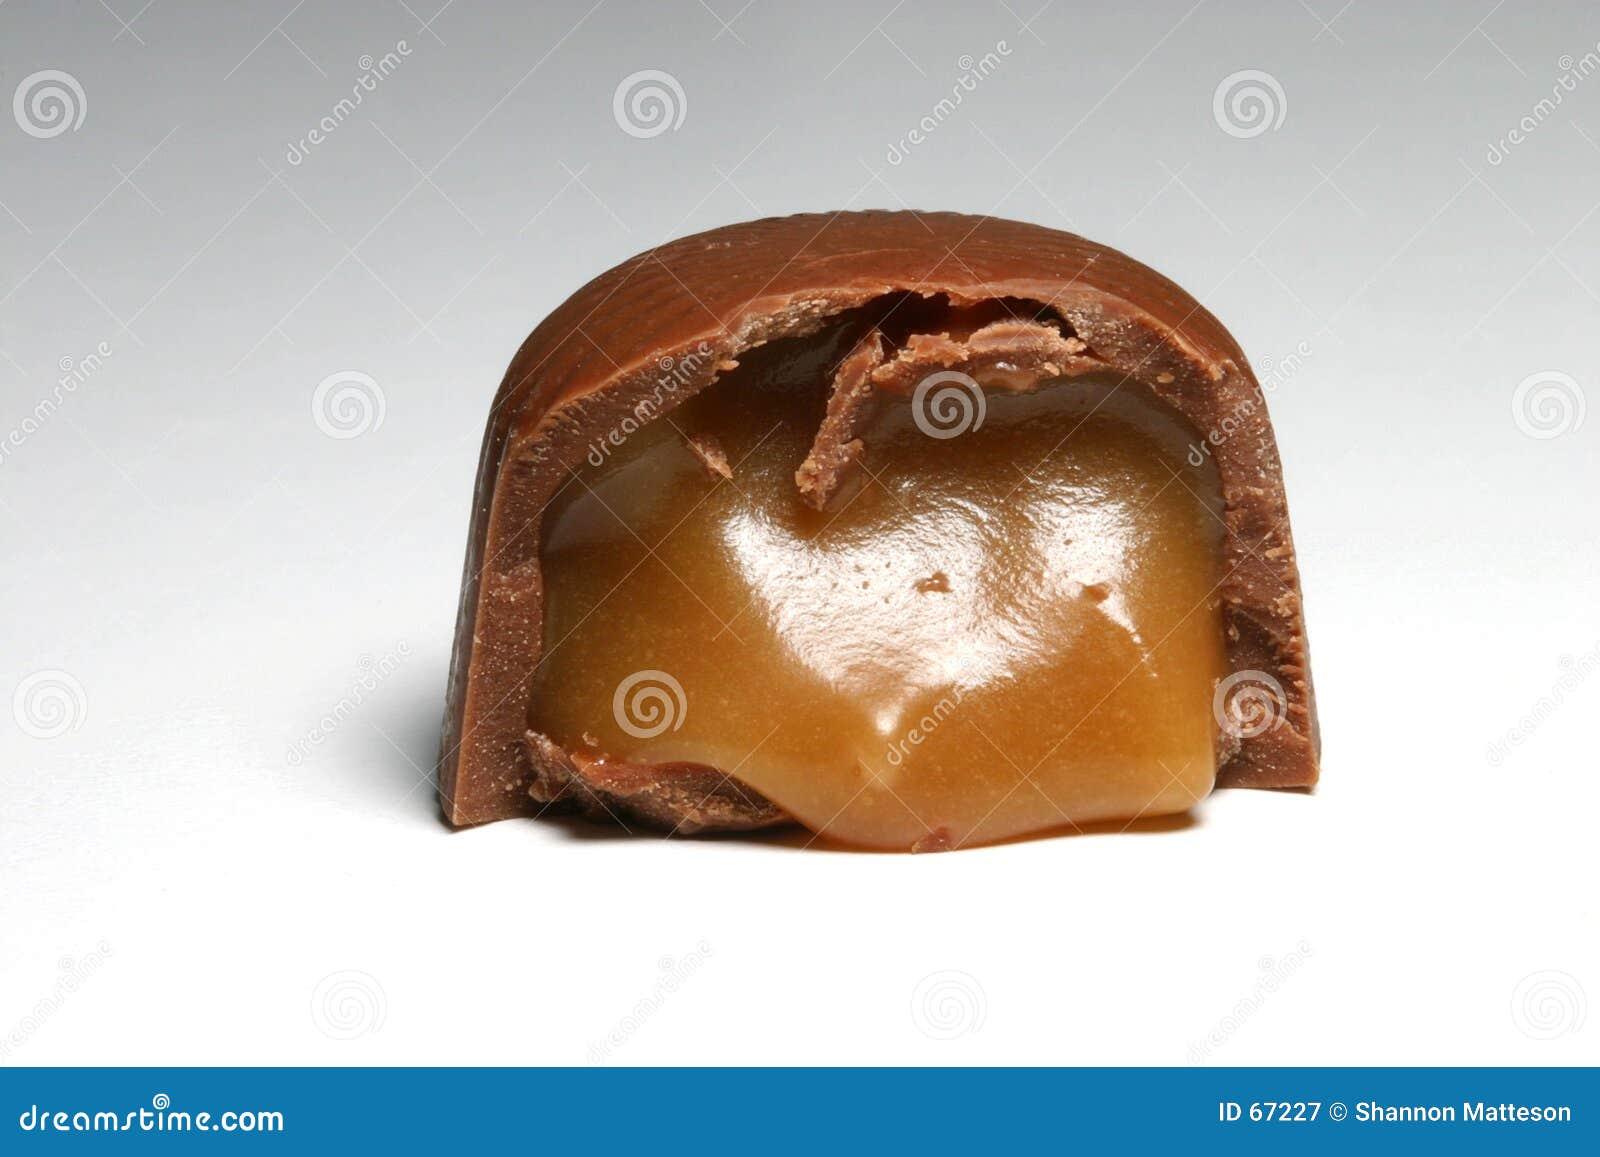 шоколад карамельки